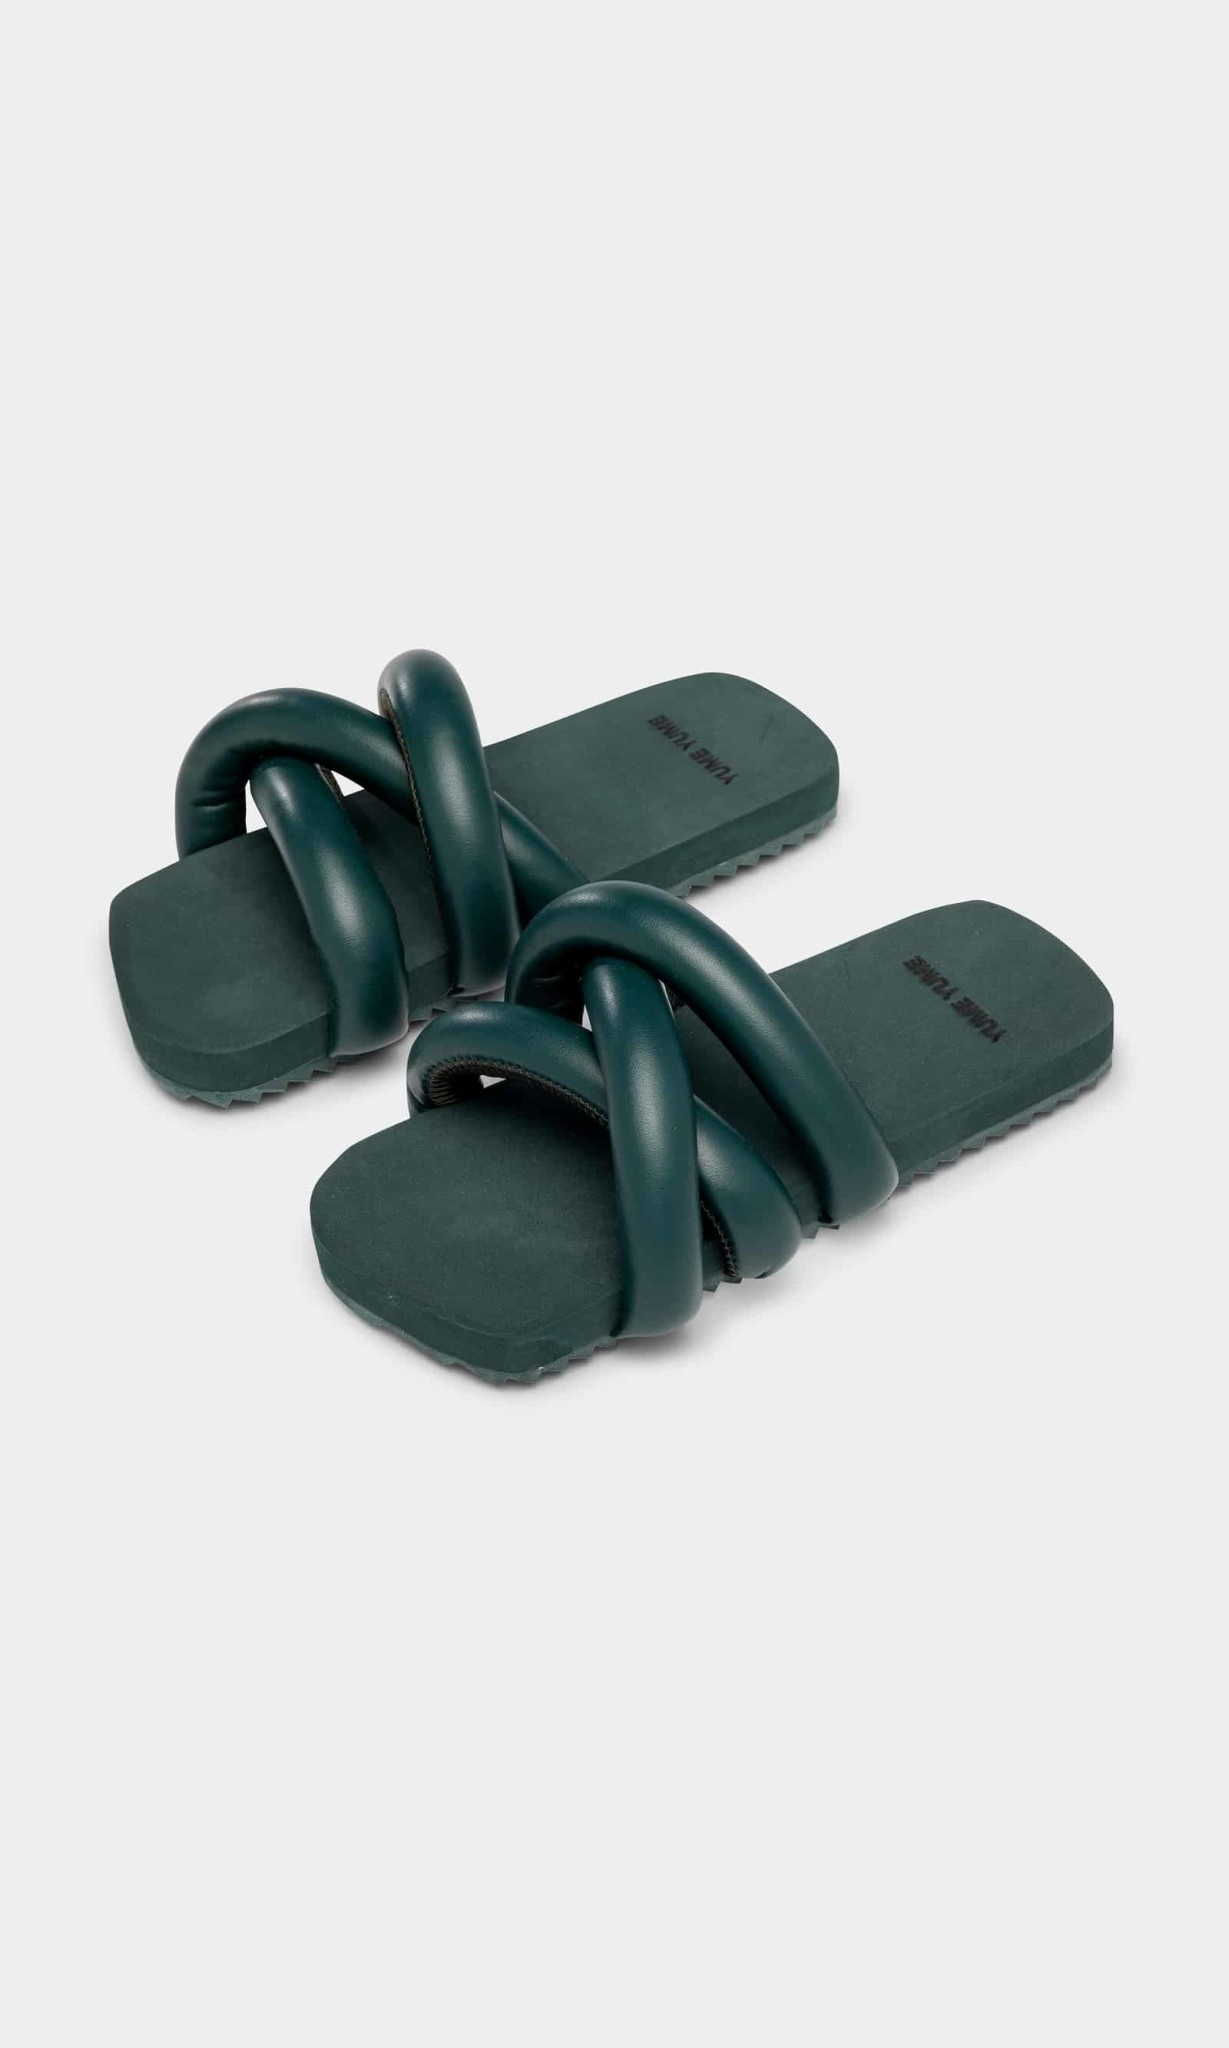 Yume Yume Tyre vegan leather slide